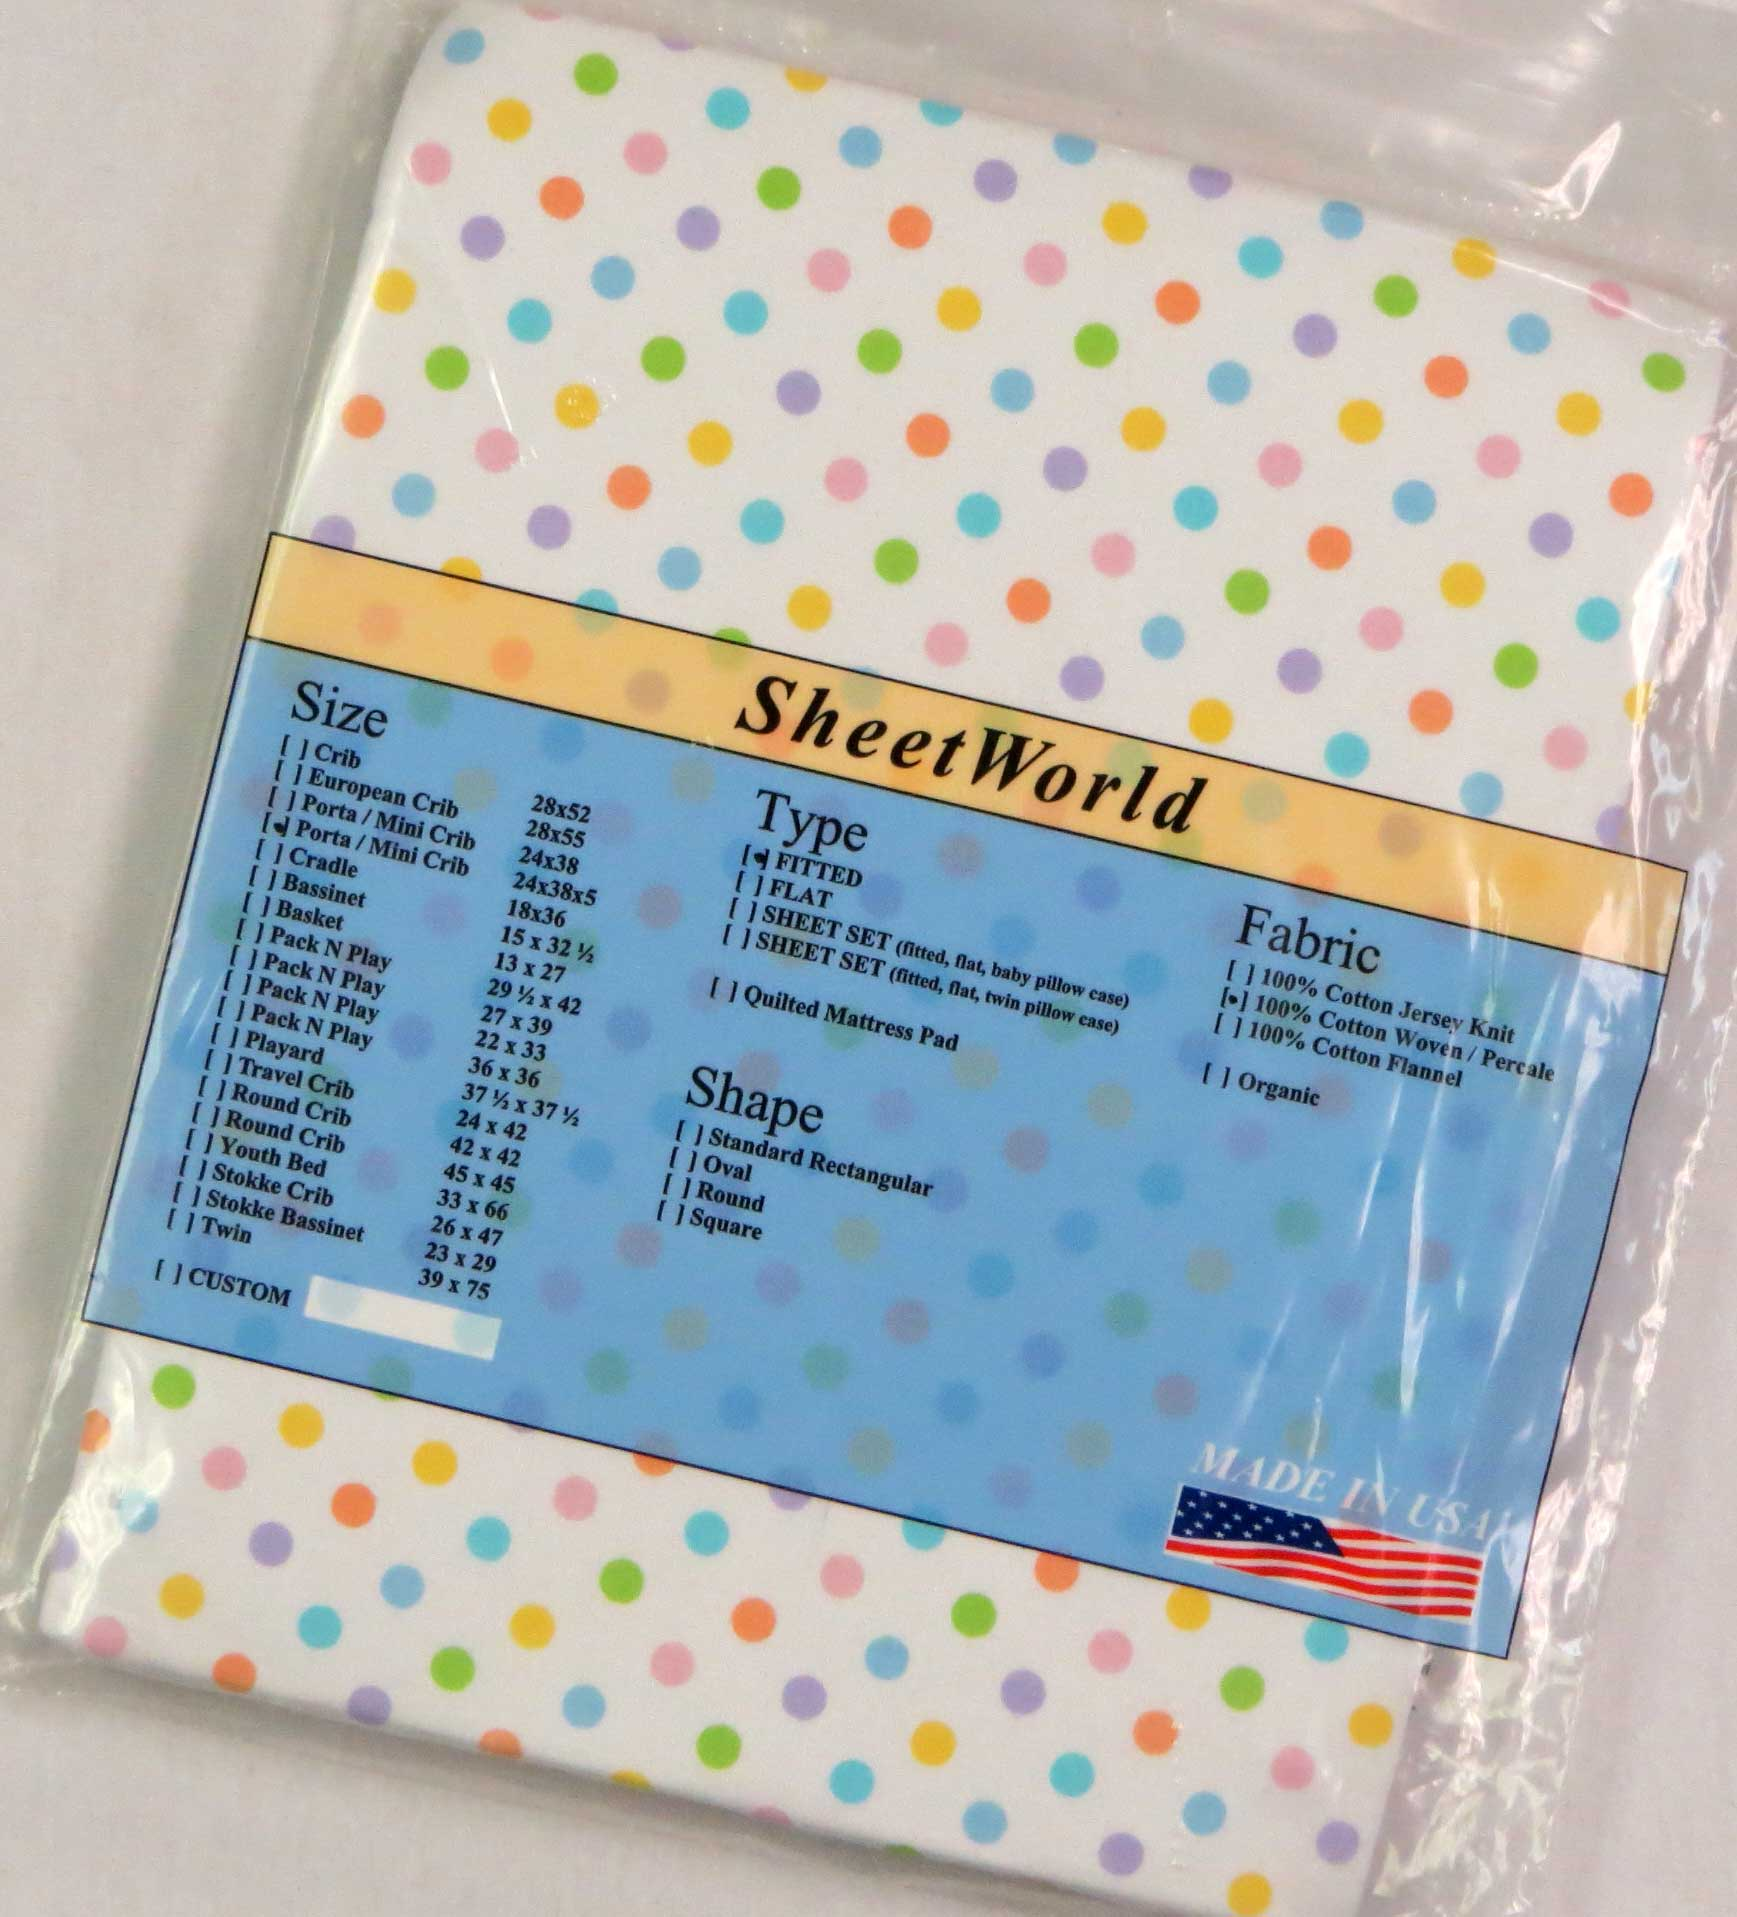 Pastel Colorful Dots Cotton Portable / Mini Crib Sheet - 24 x 38 x 5